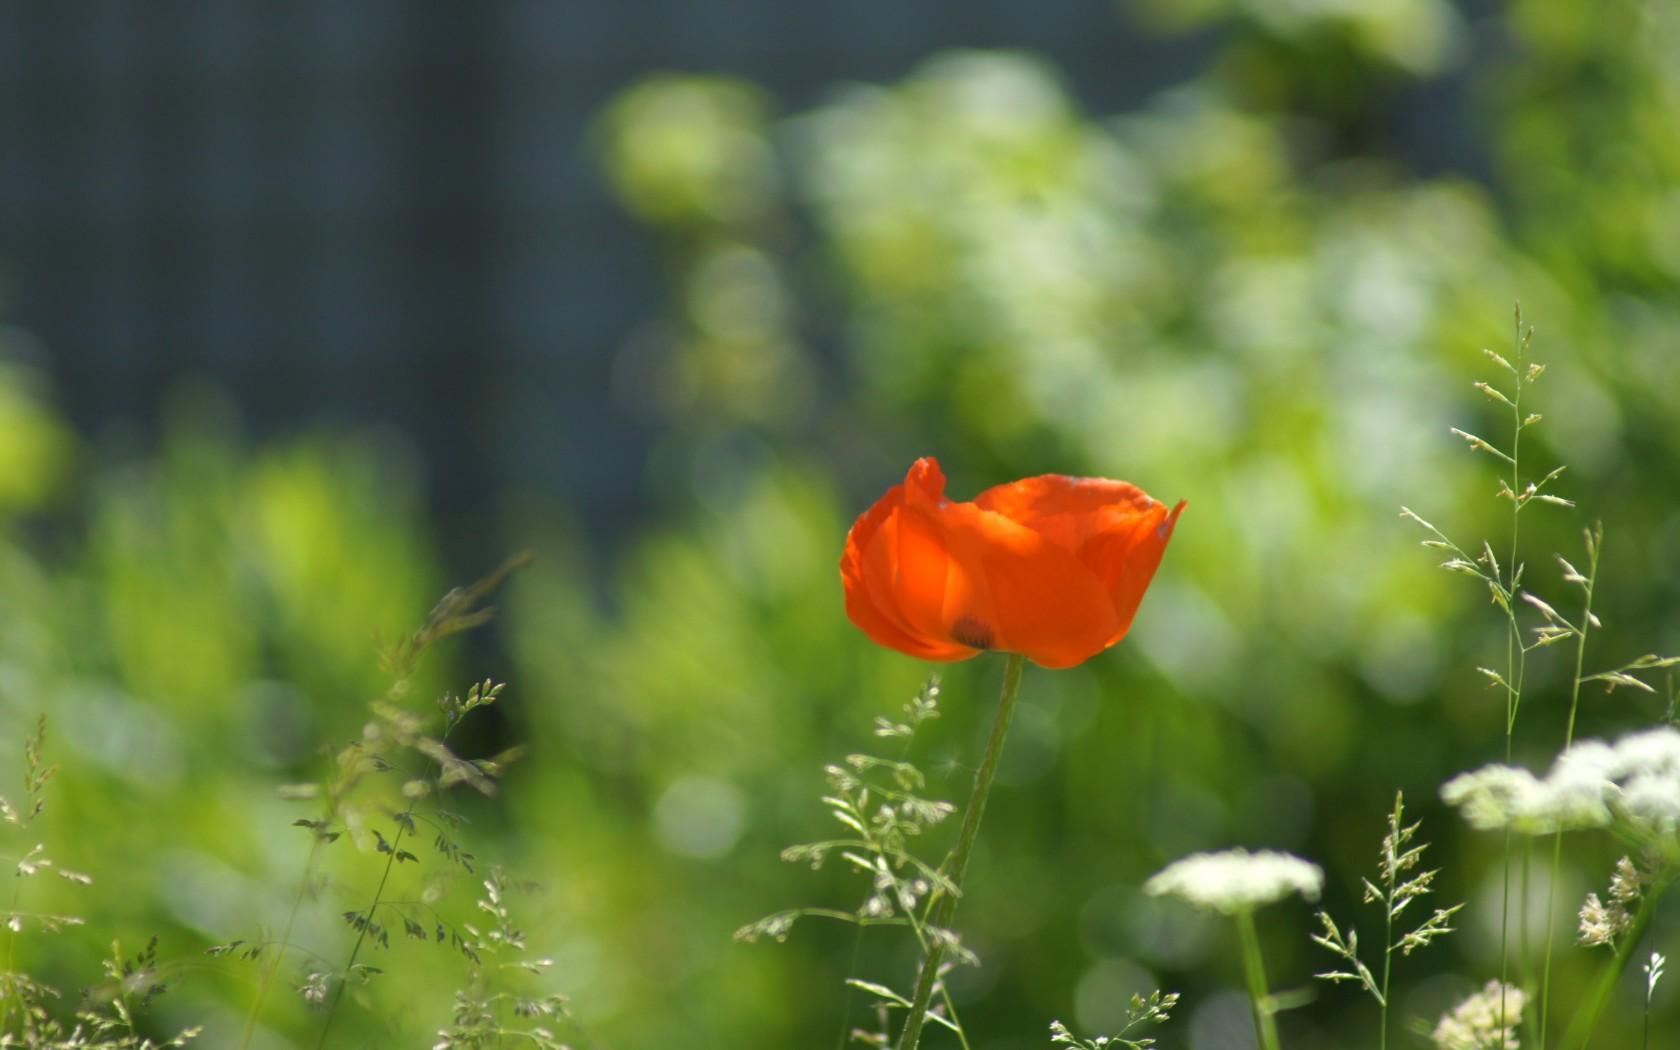 Фото клипарт – Луга, цветы, лето (76 ...: nevsepic.com.ua/ostalnoe-bez-razdela/20600-foto-klipart-luga-cvety...